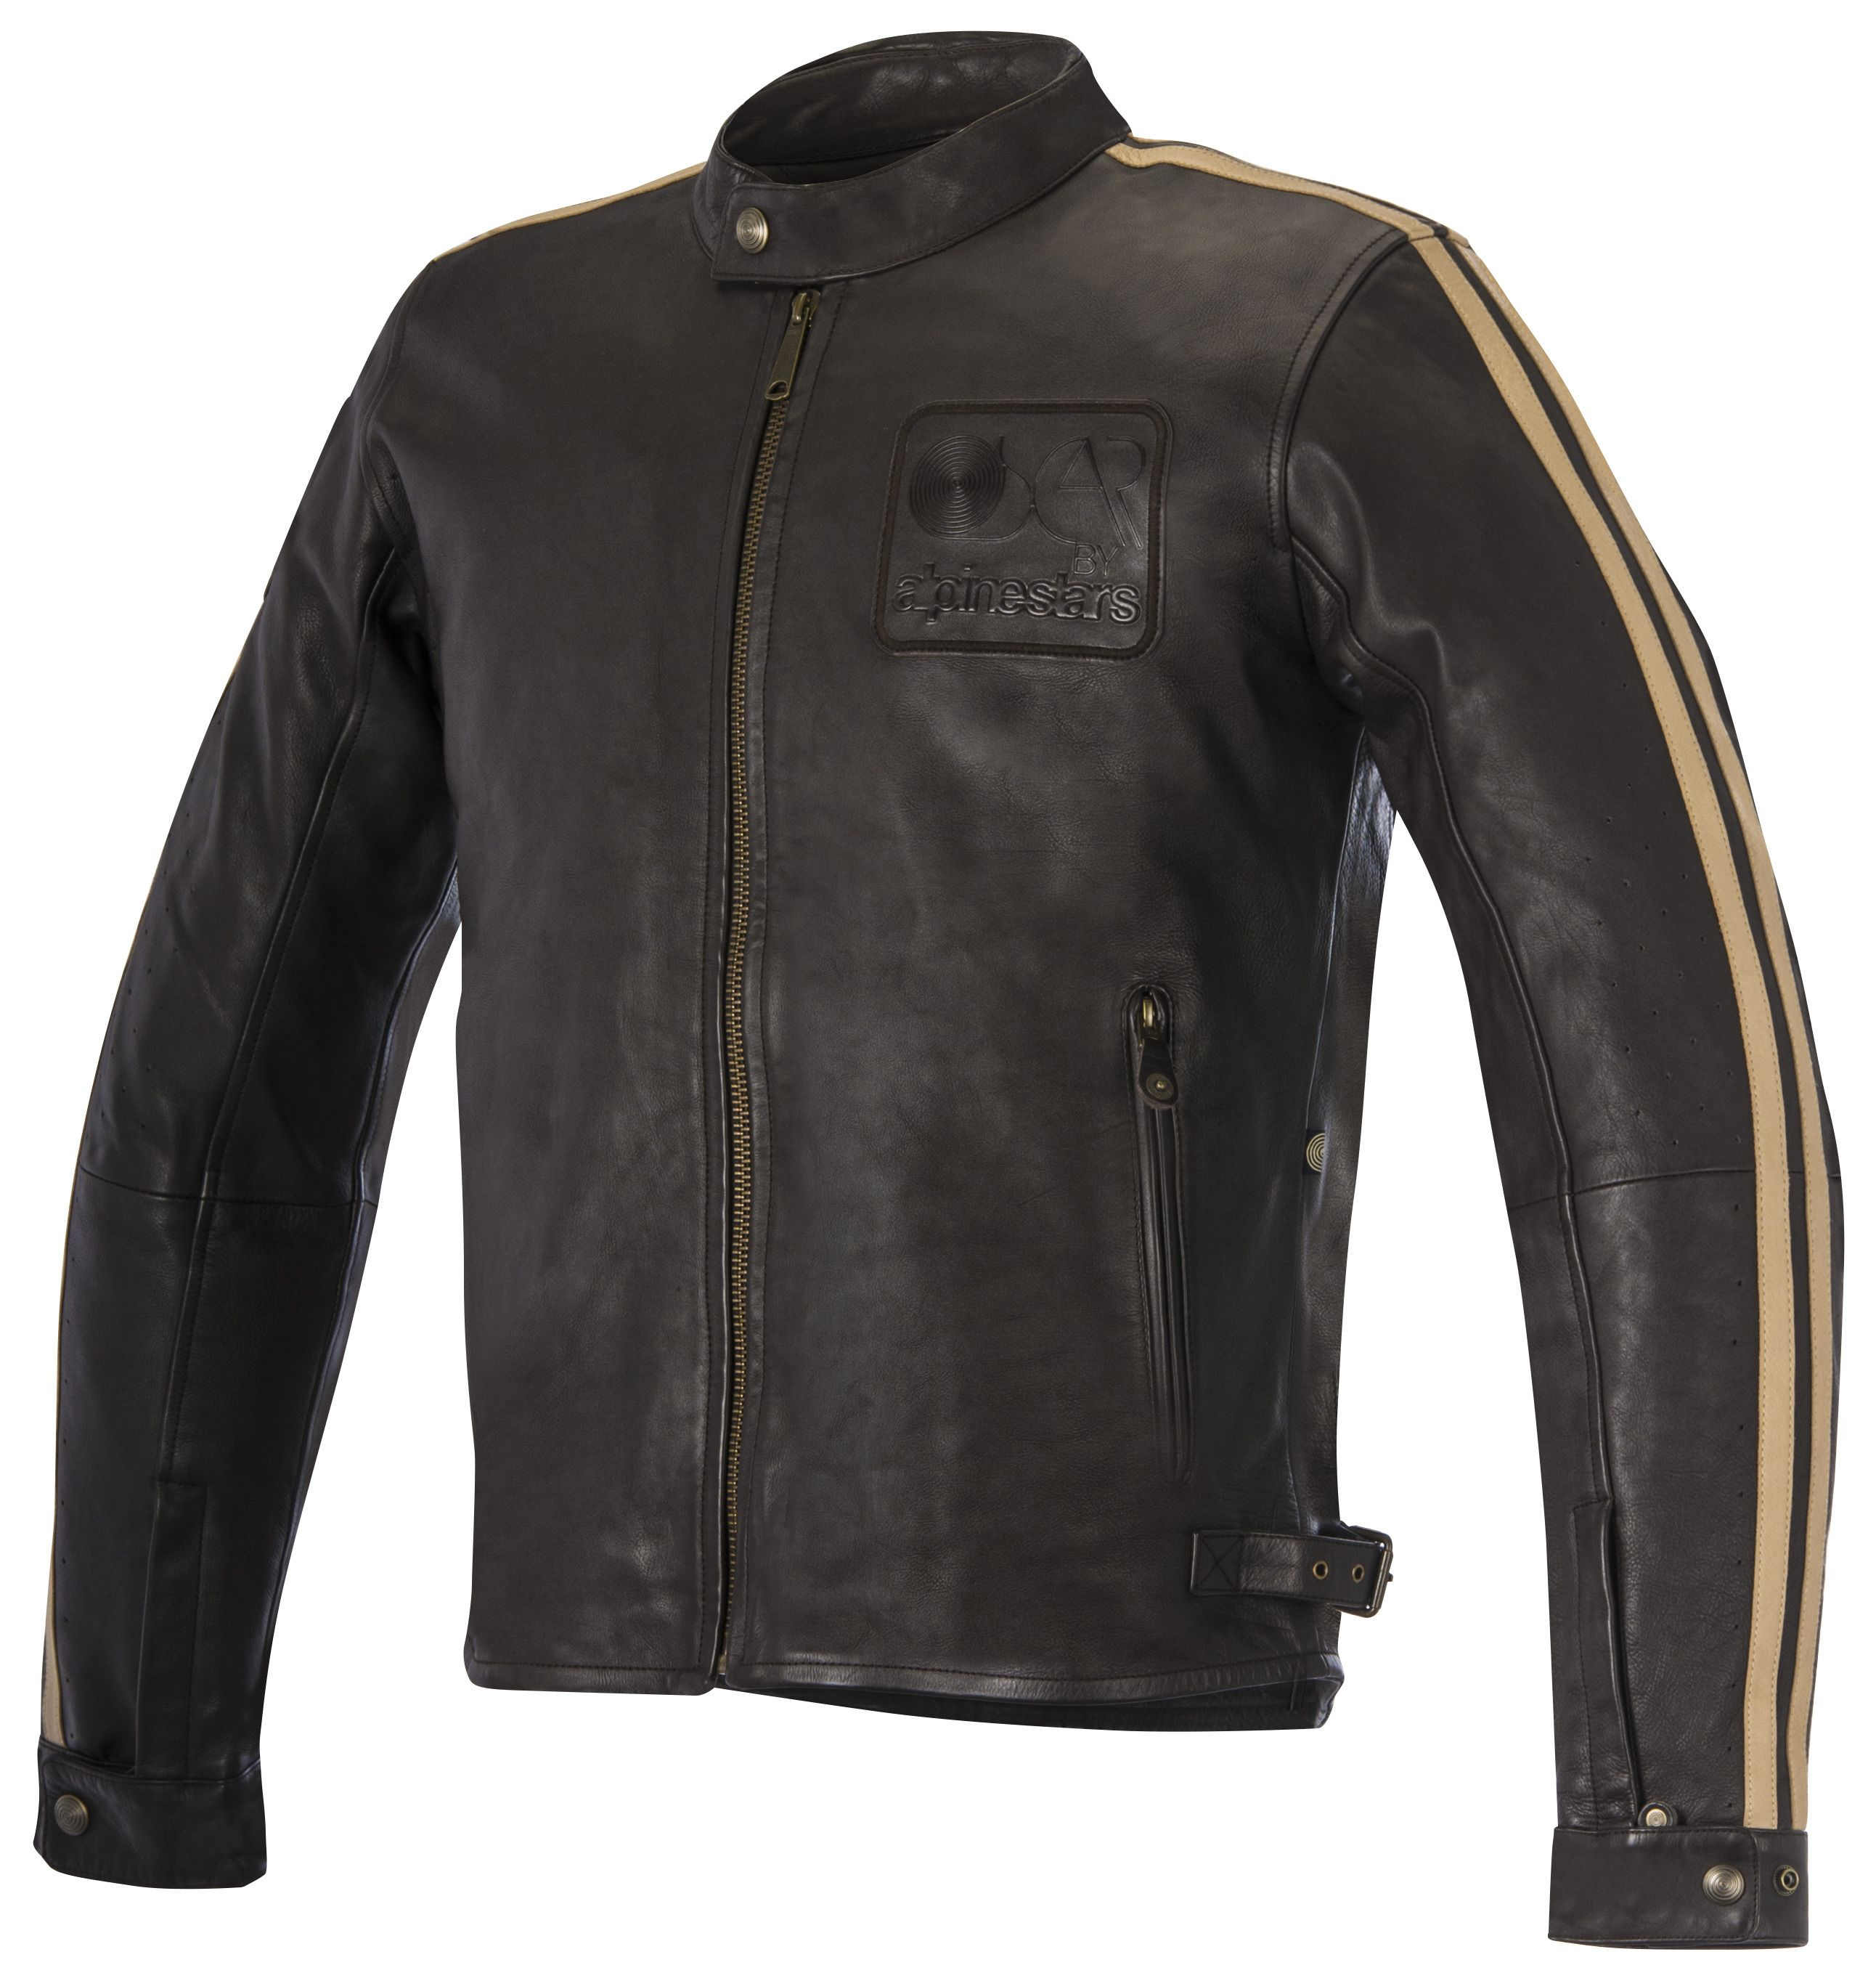 Alpinestars Leather Jacket >> Alpinestars Oscar Charlie Leather Jacket Revzilla